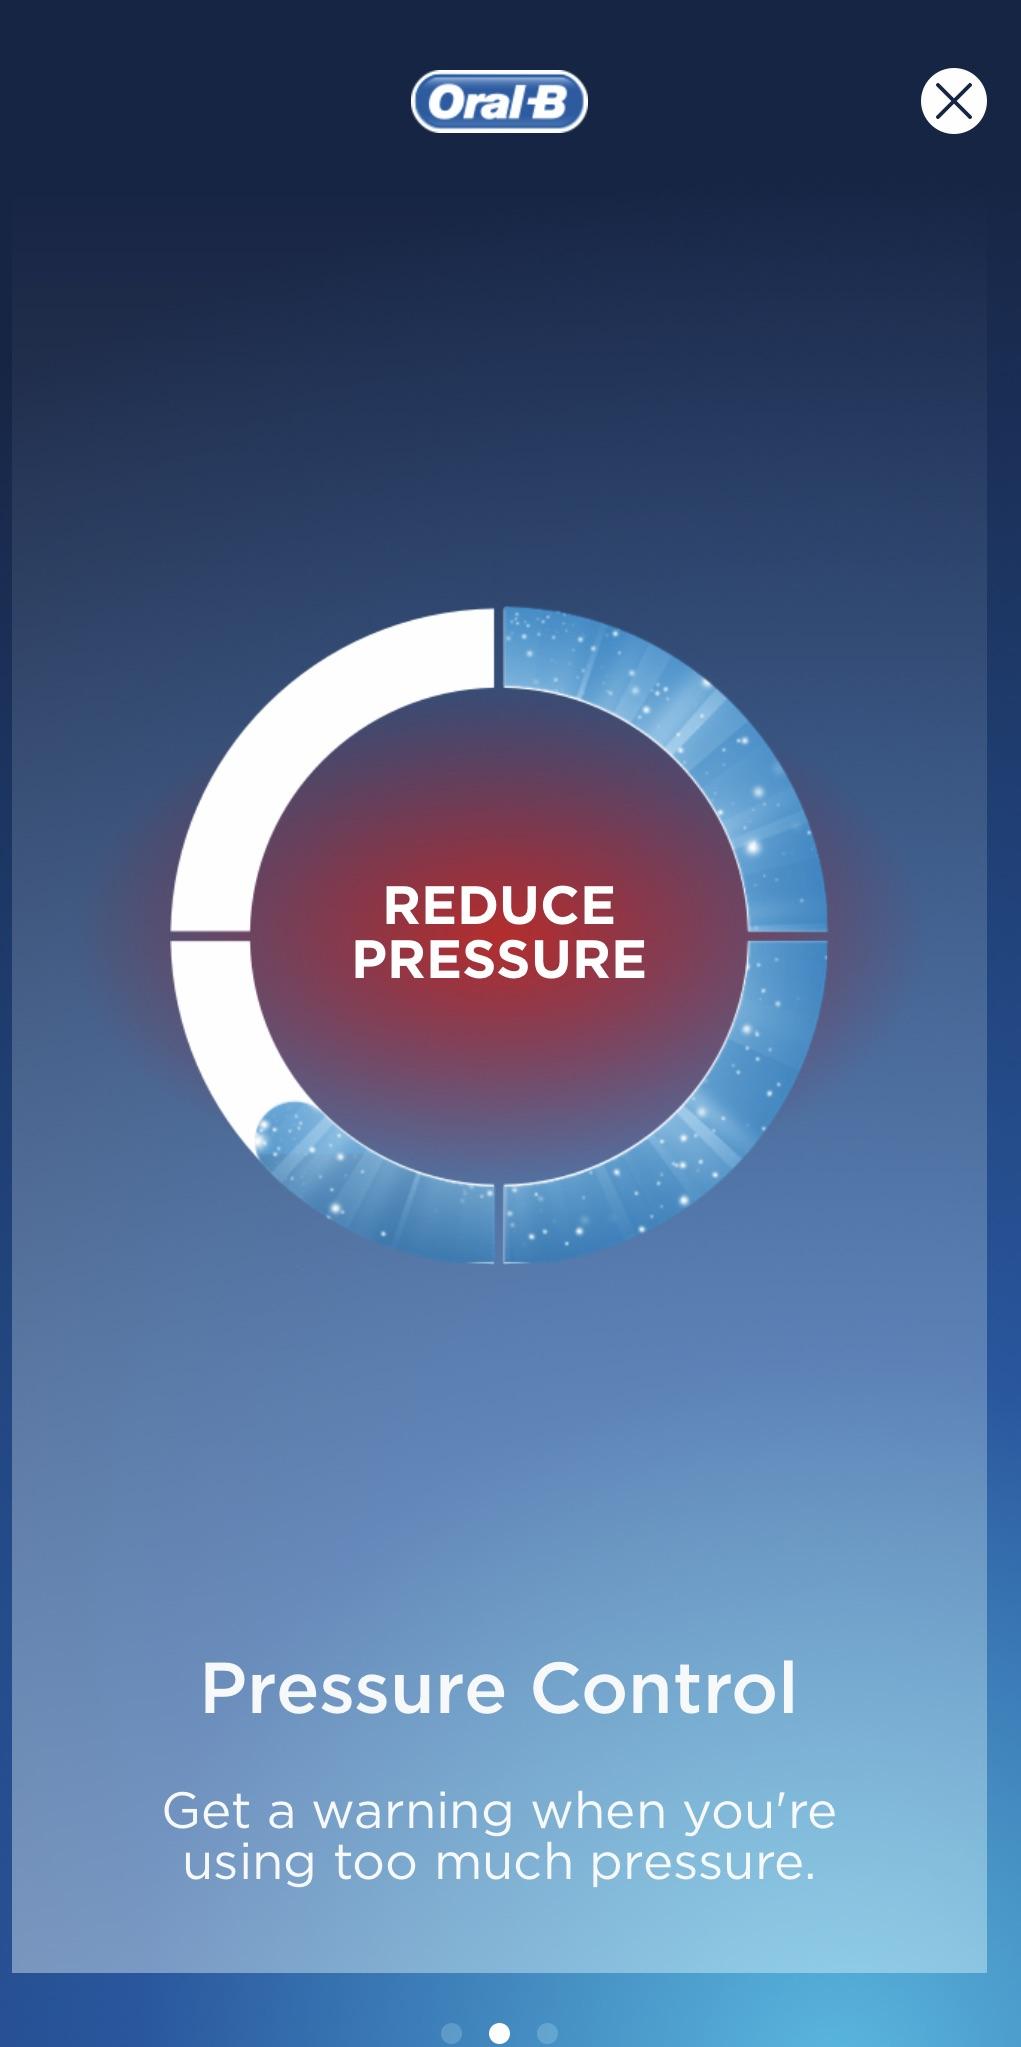 Reduce pressure oral-b